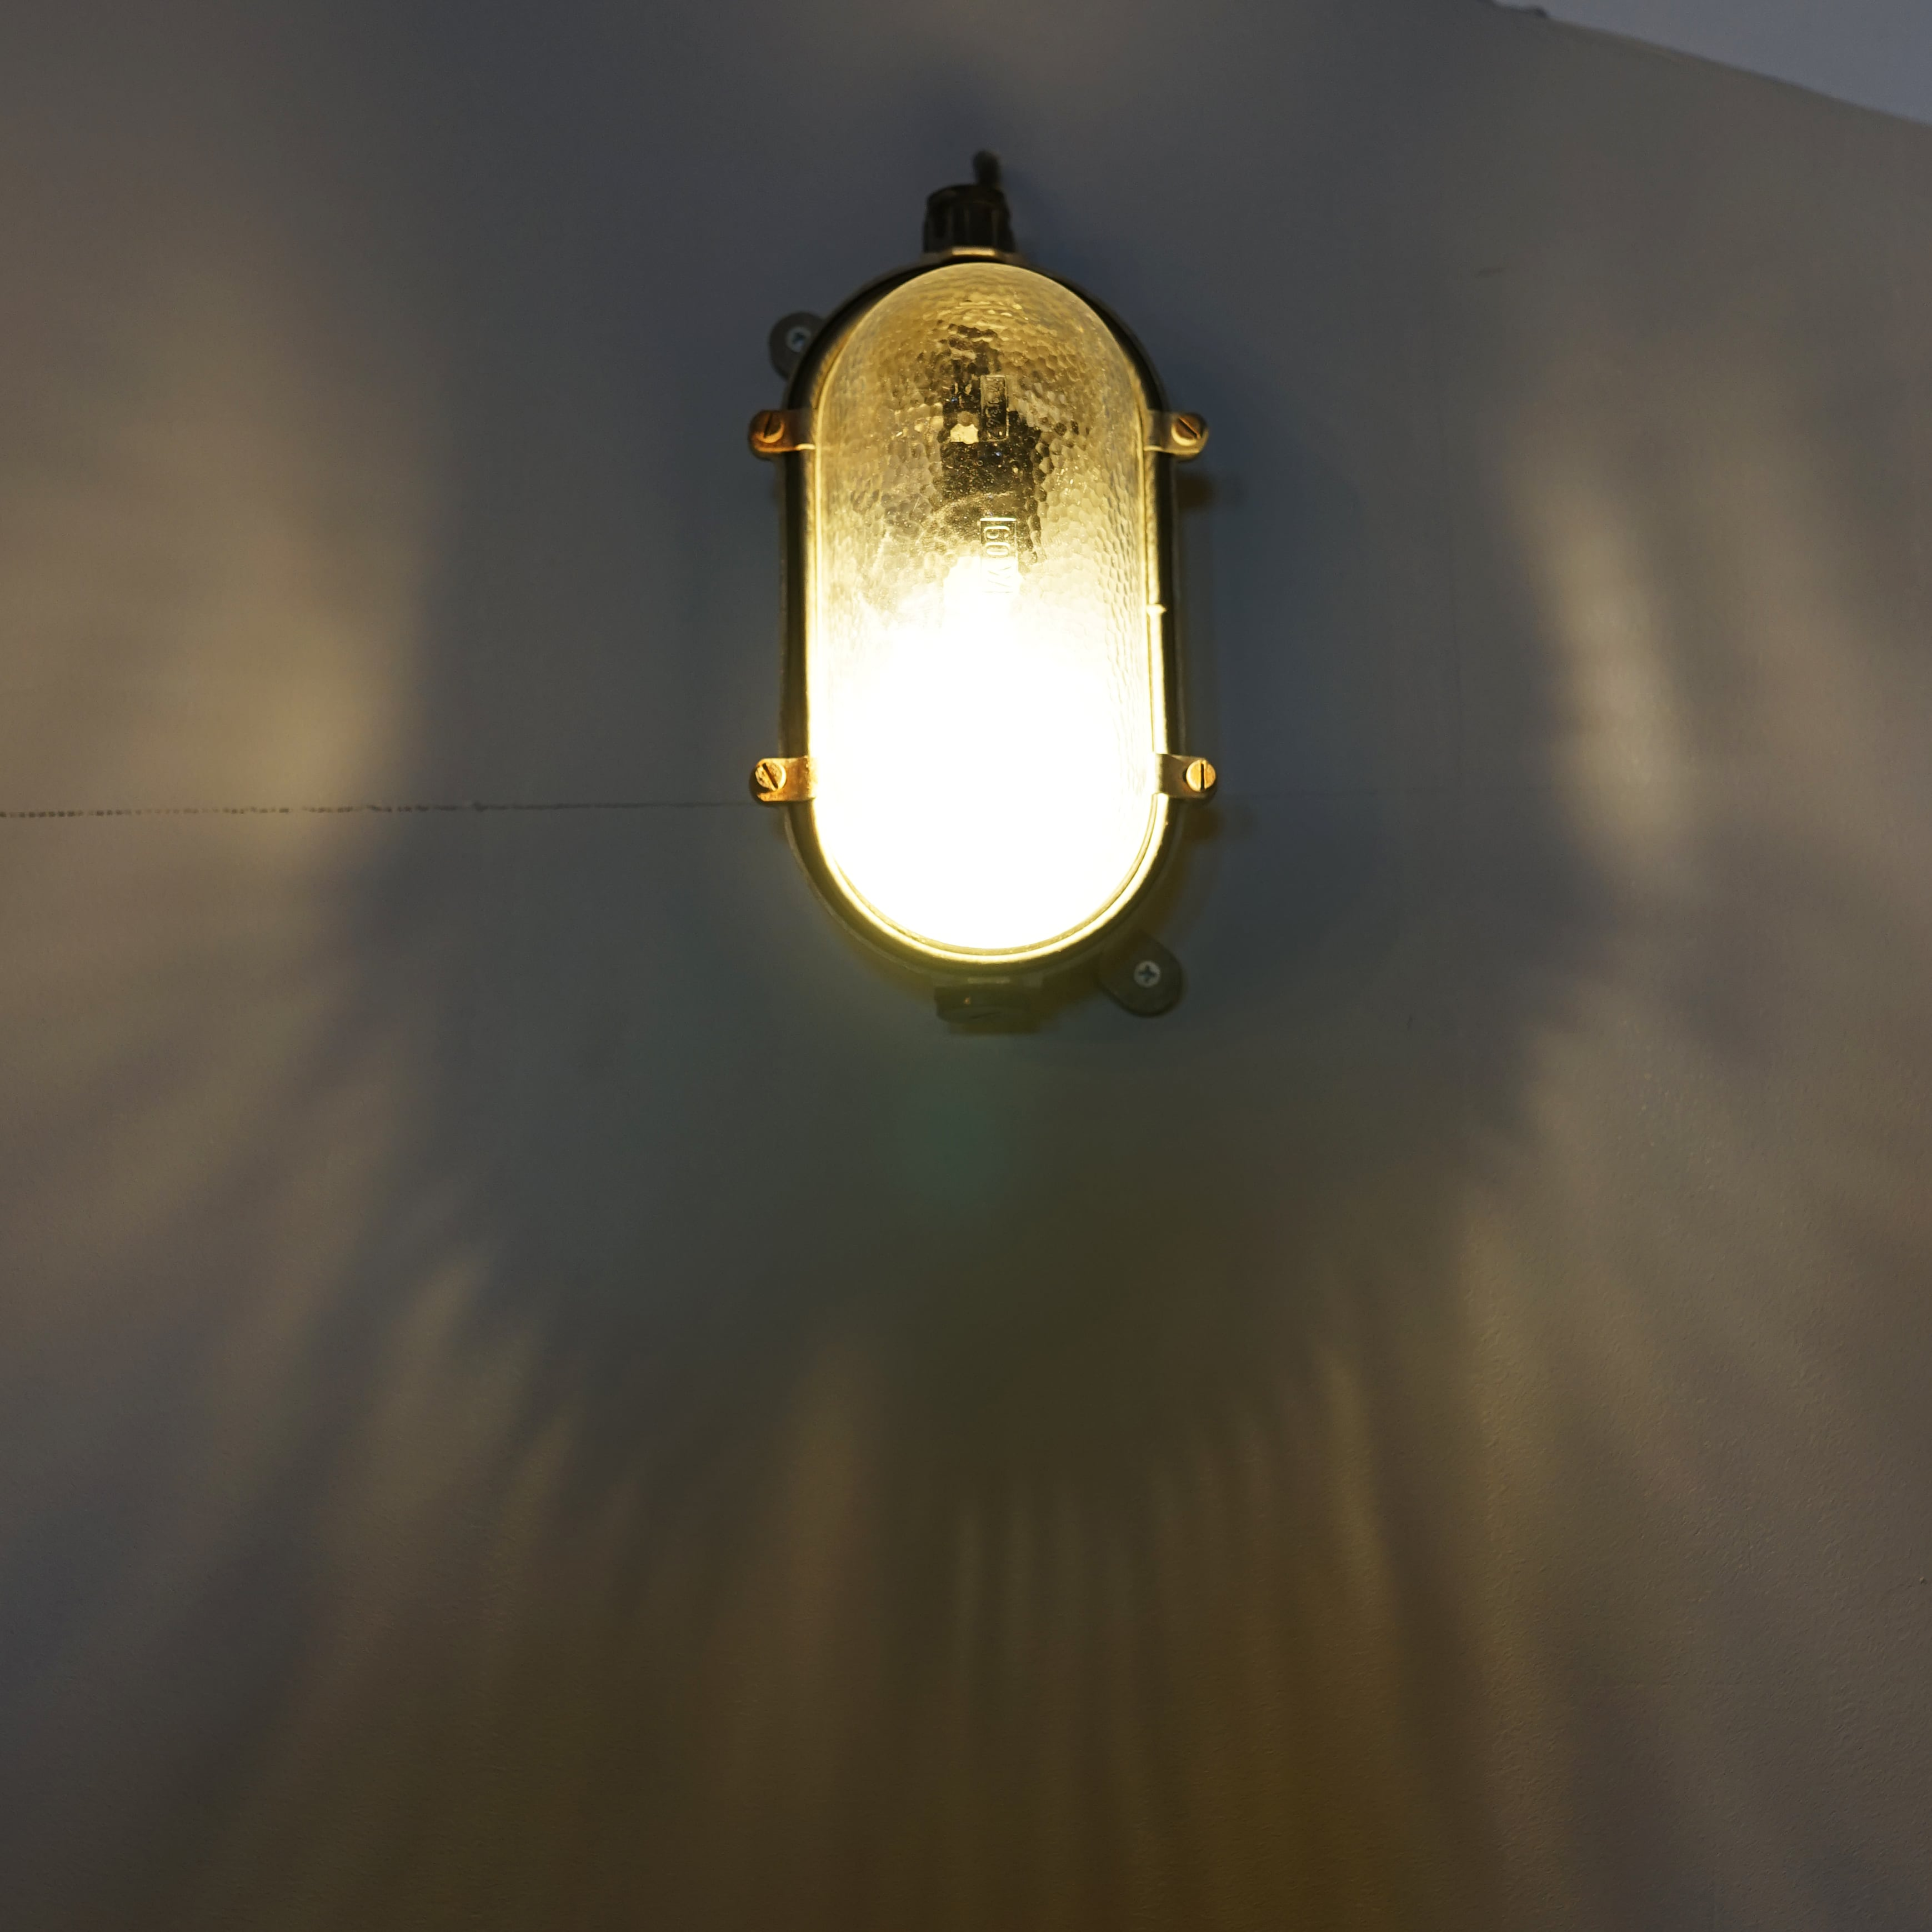 #01-04  Bracket room light